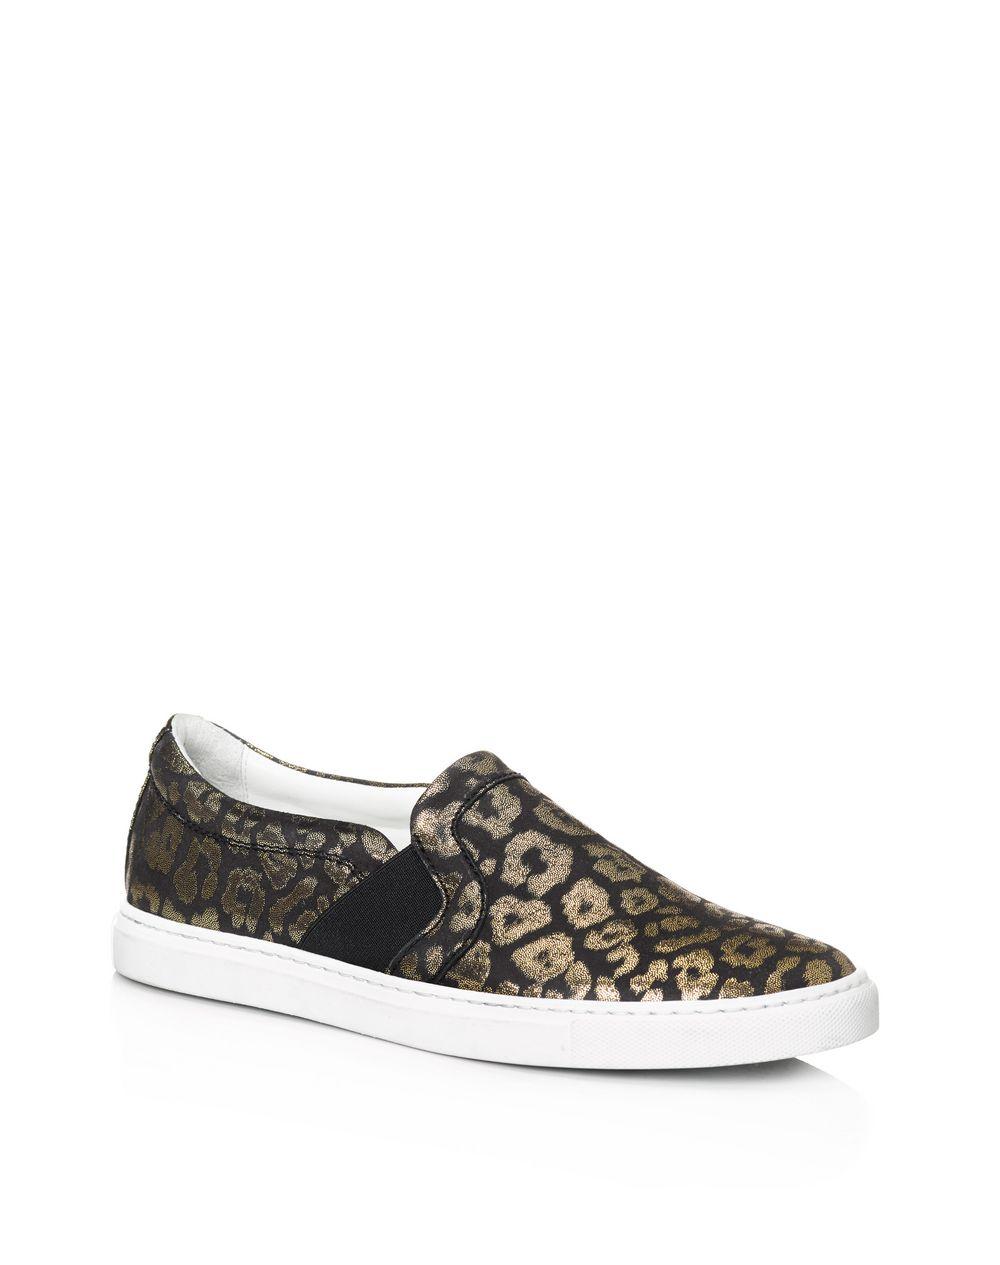 size 40 91d7b a9d30 Sneakers Slip On Laminate Leopardate Lanvin, Sneakers Donna ...